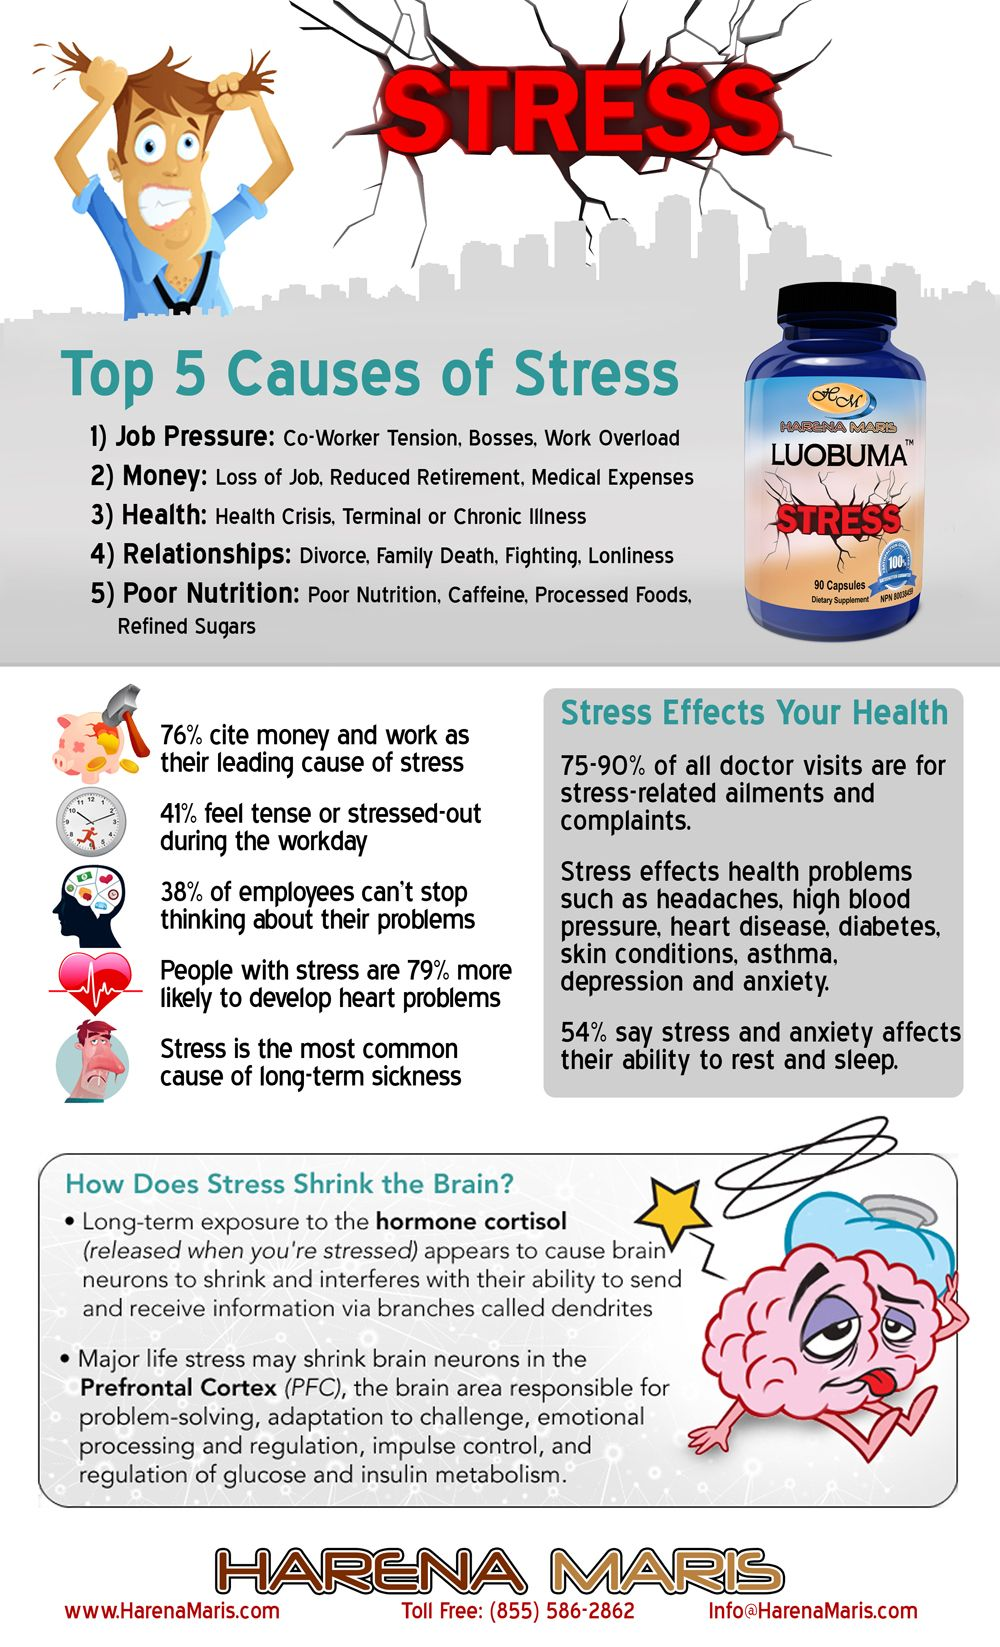 causes of stress Top 5 Causes of Stress Stress causes